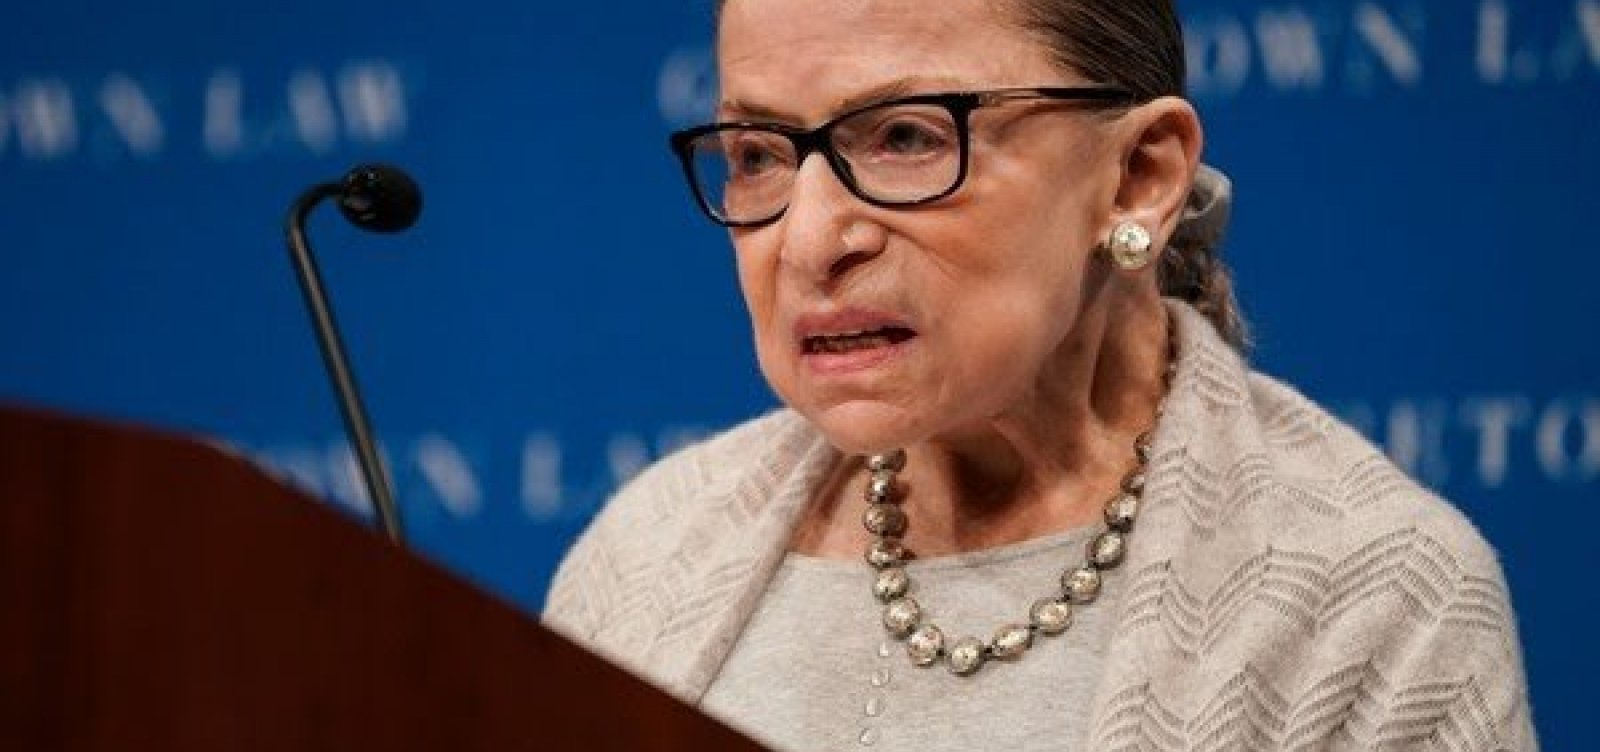 [Juíza mais antiga da Suprema Corte dos EUA, Ruth Bader Ginsburg morre aos 87 anos]